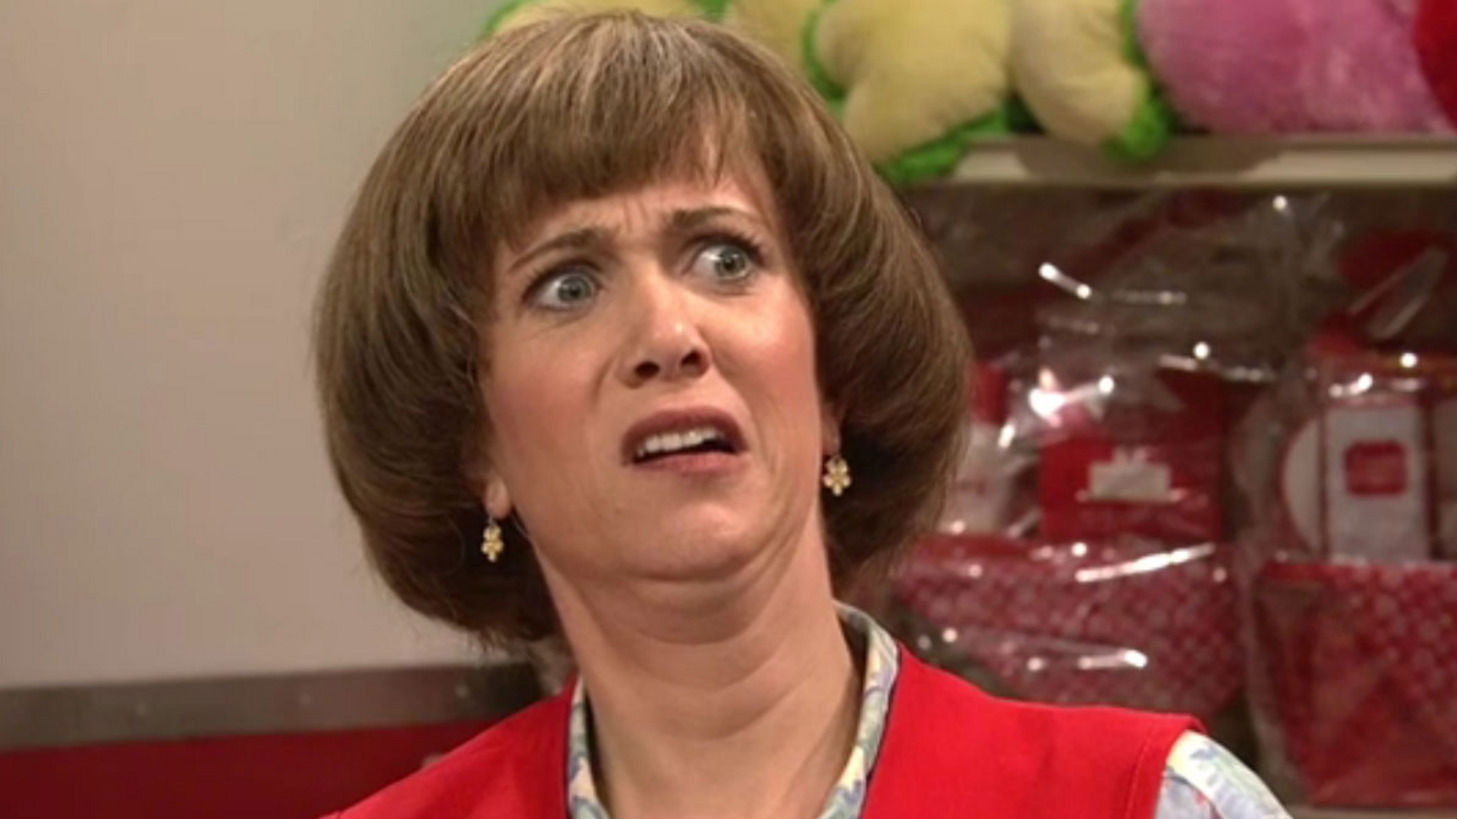 Disgusted Kristen Wiig SNL